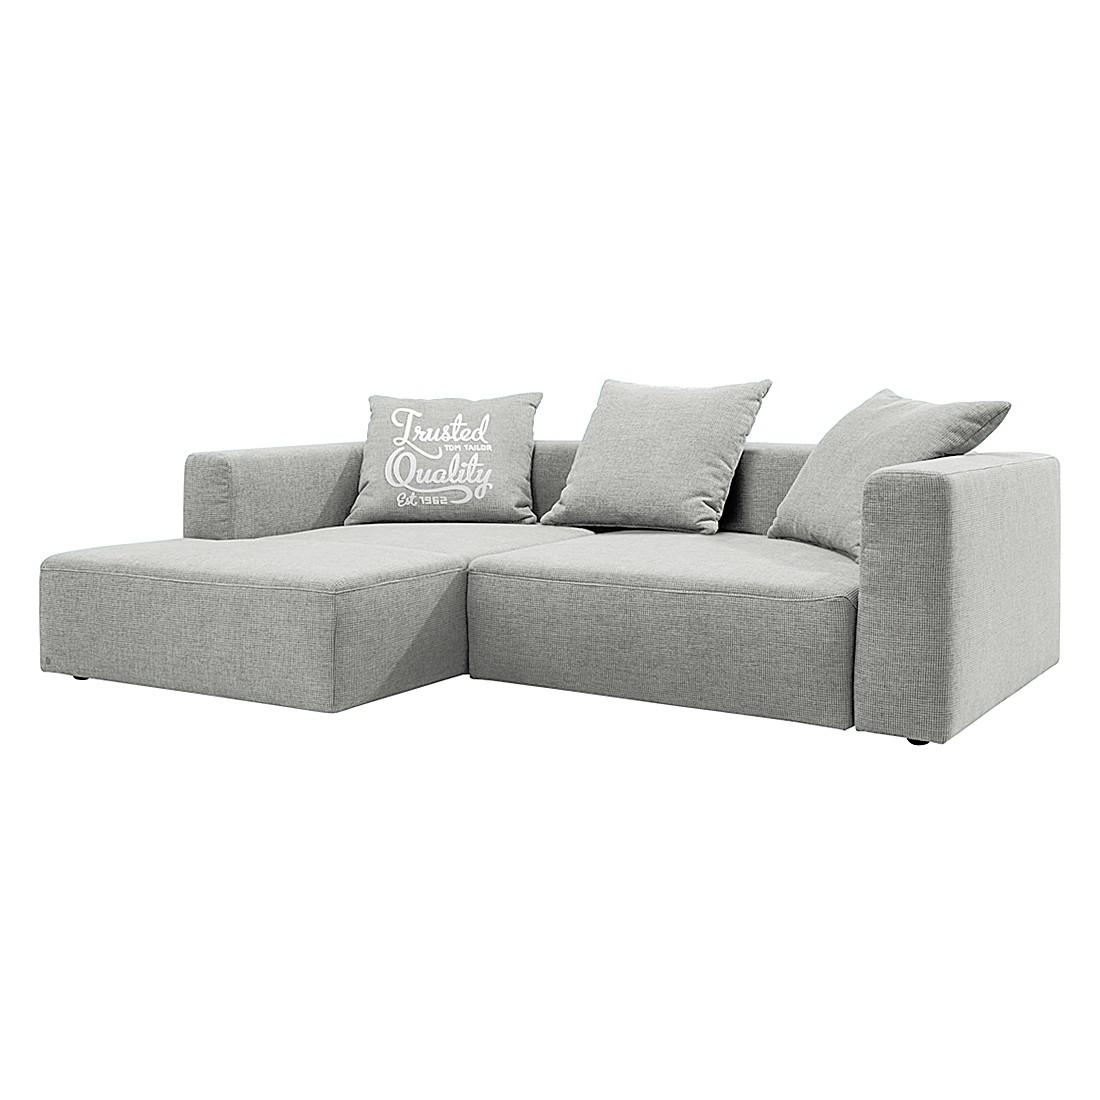 Canapé d'angle Heaven Casual XL